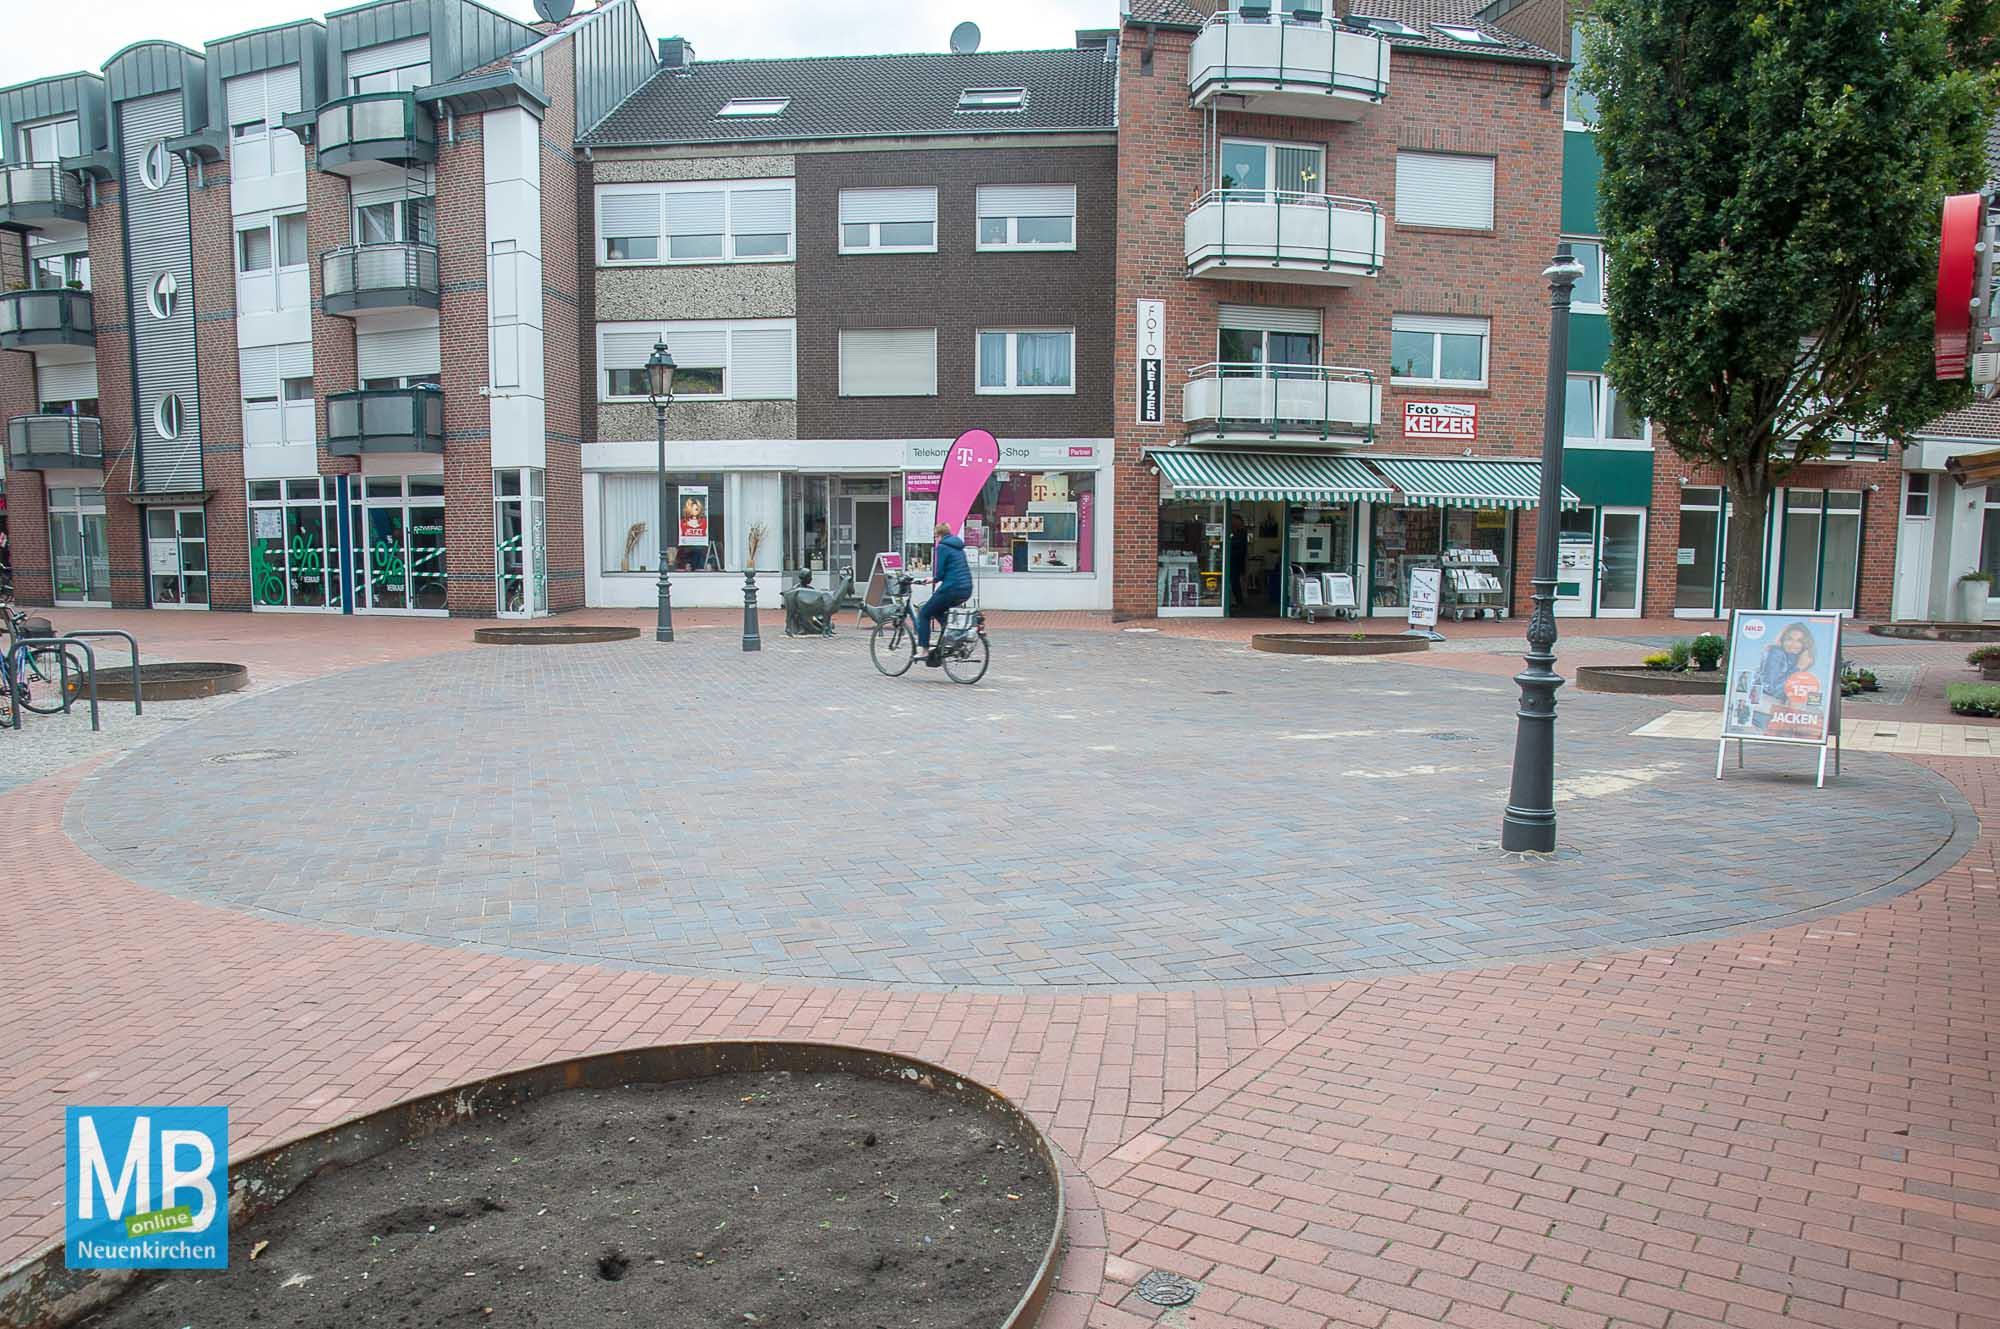 Umgestaltung Fußgängerzone